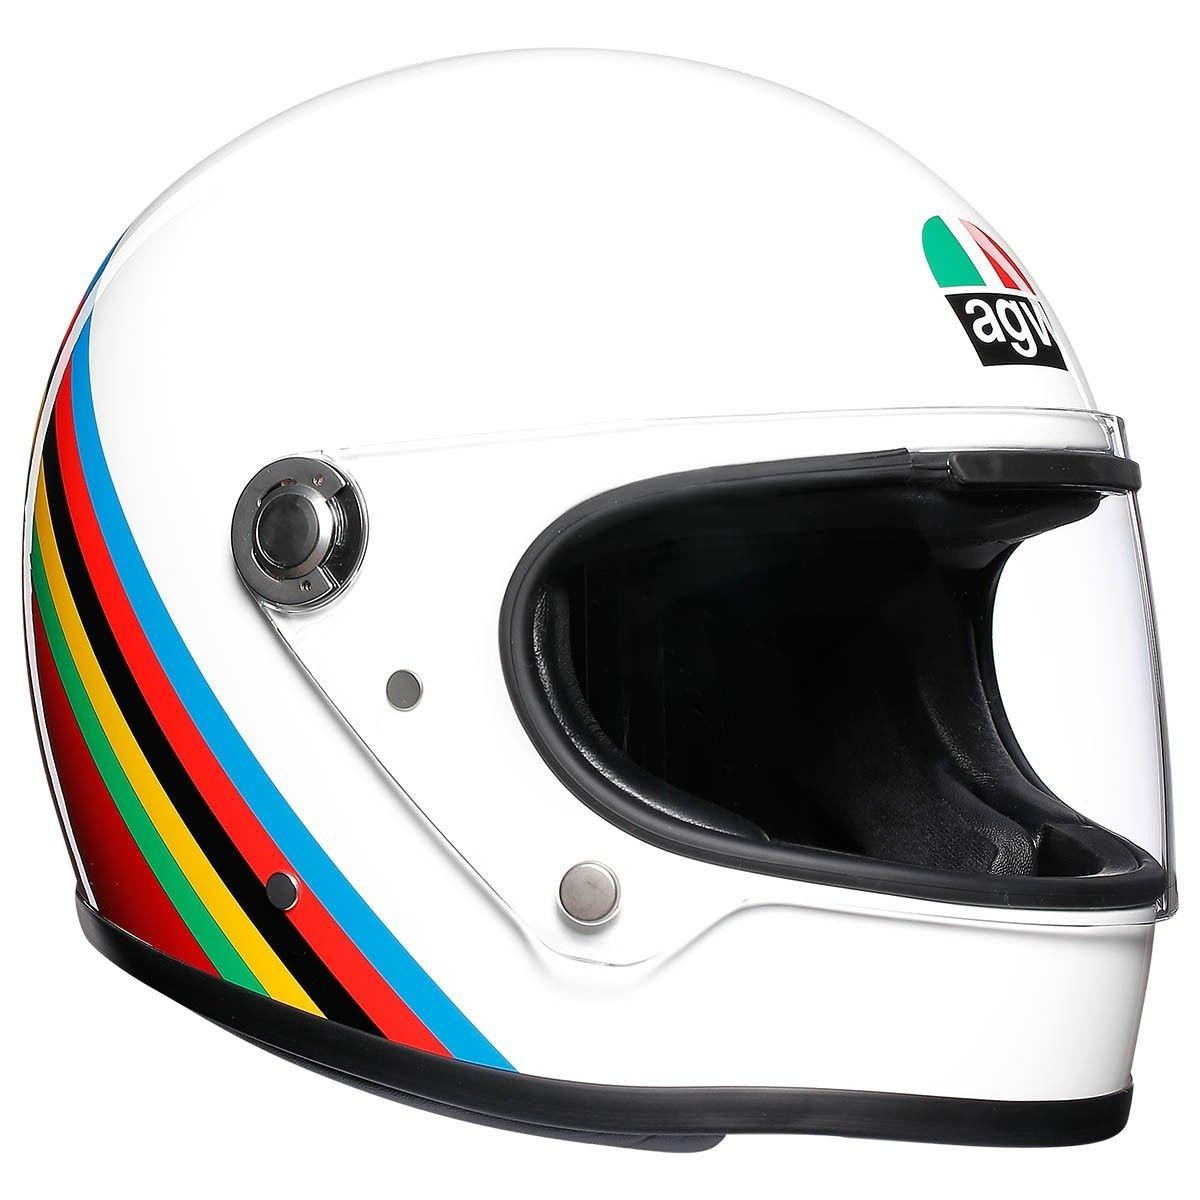 New Gear: AGV X3000 Red/White Retro Helmet - Bike Review